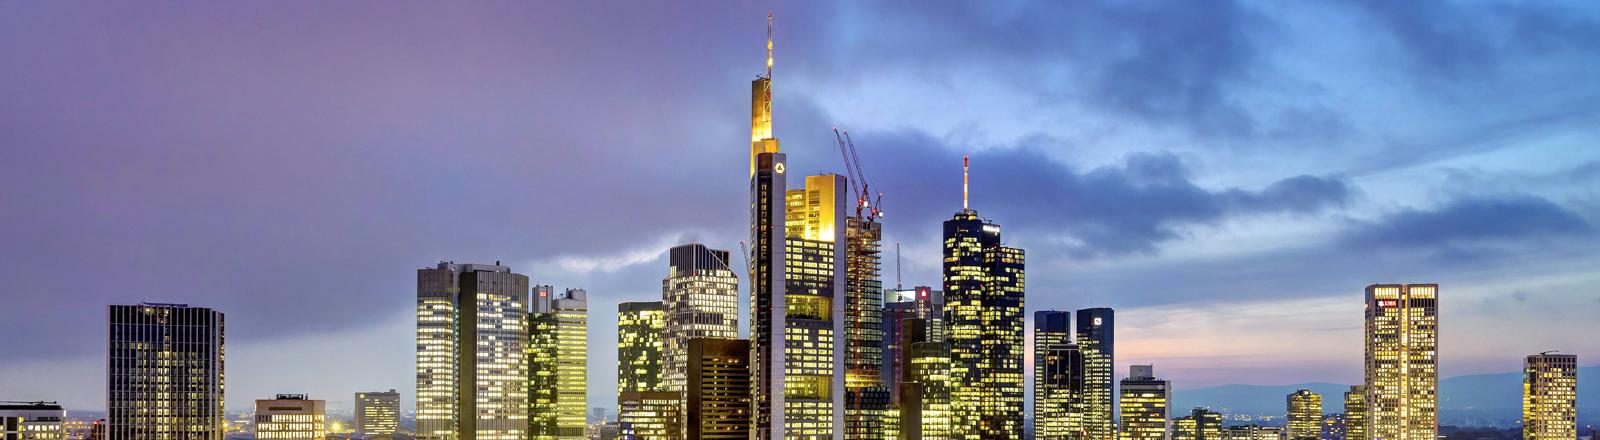 Frankfurter Skyline am Abend